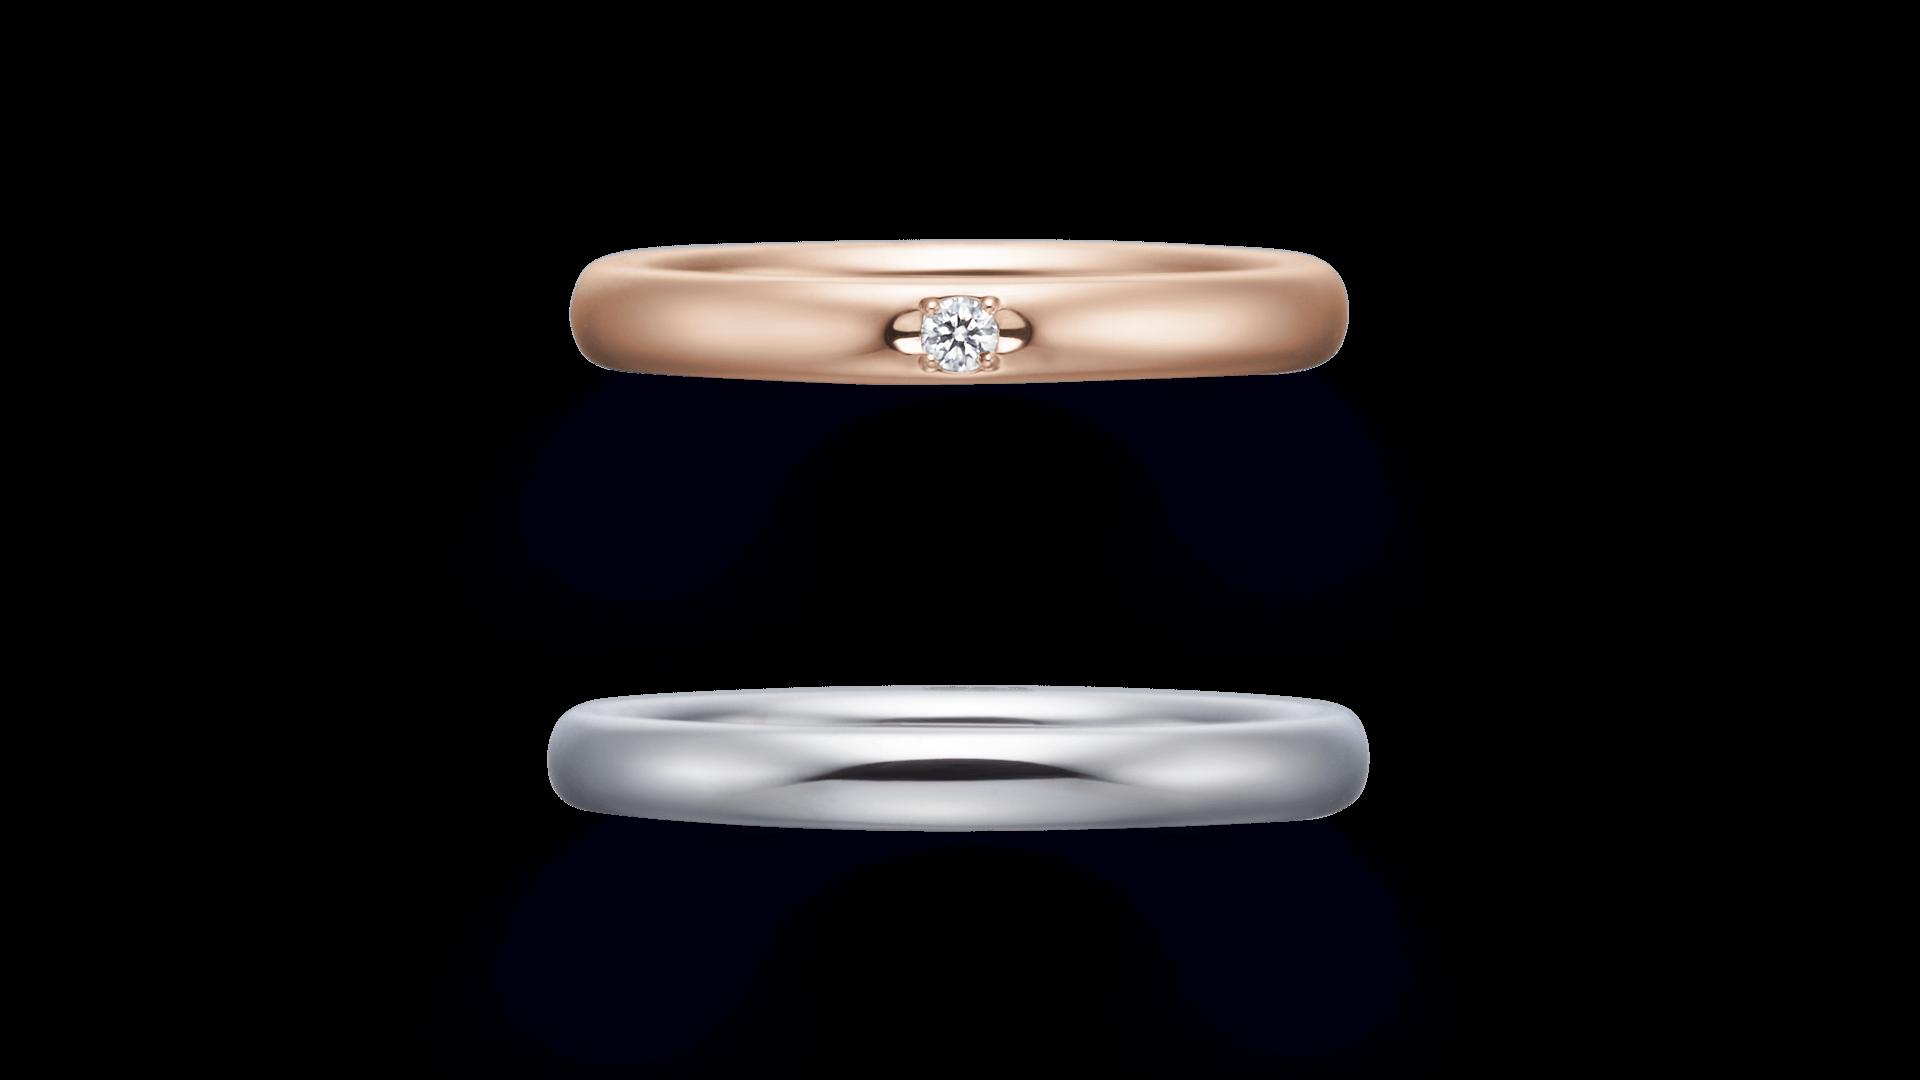 Origin Belief01 オリジンビリーフ01 | 結婚指輪サムネイル 1